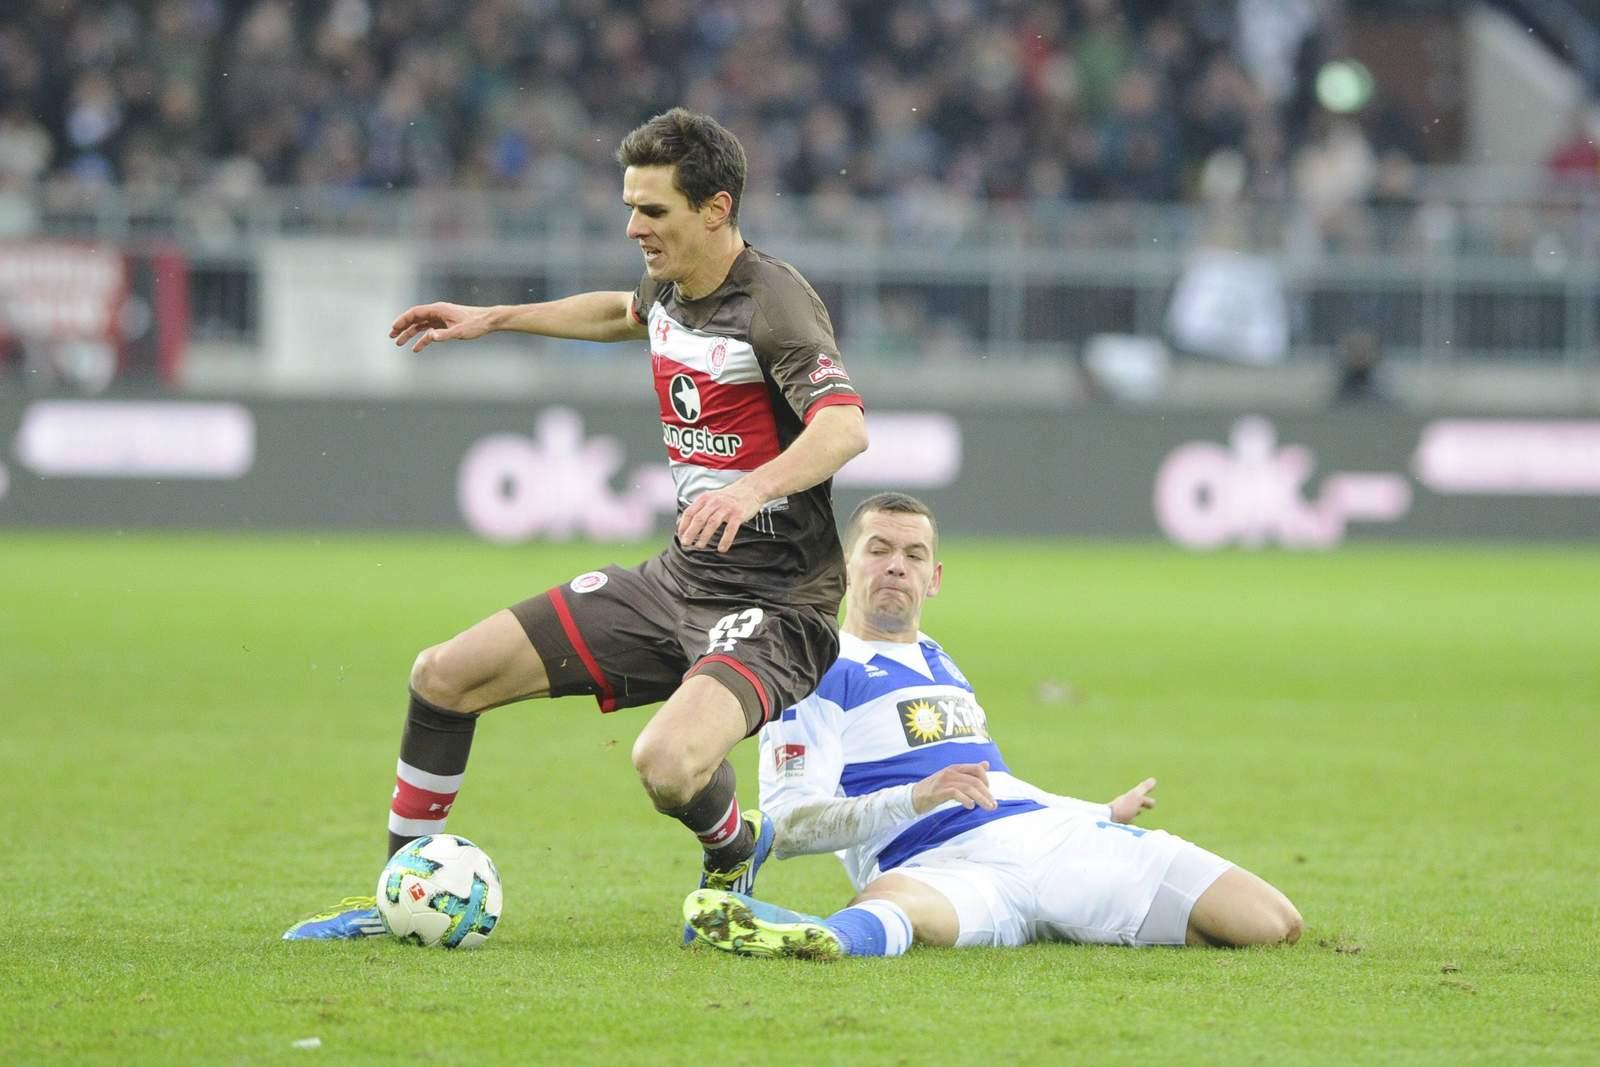 Stanislav Iljutchenko grätscht gegen Johannes Flum. Jetzt auf Duisburg gegen St. Pauli wetten.